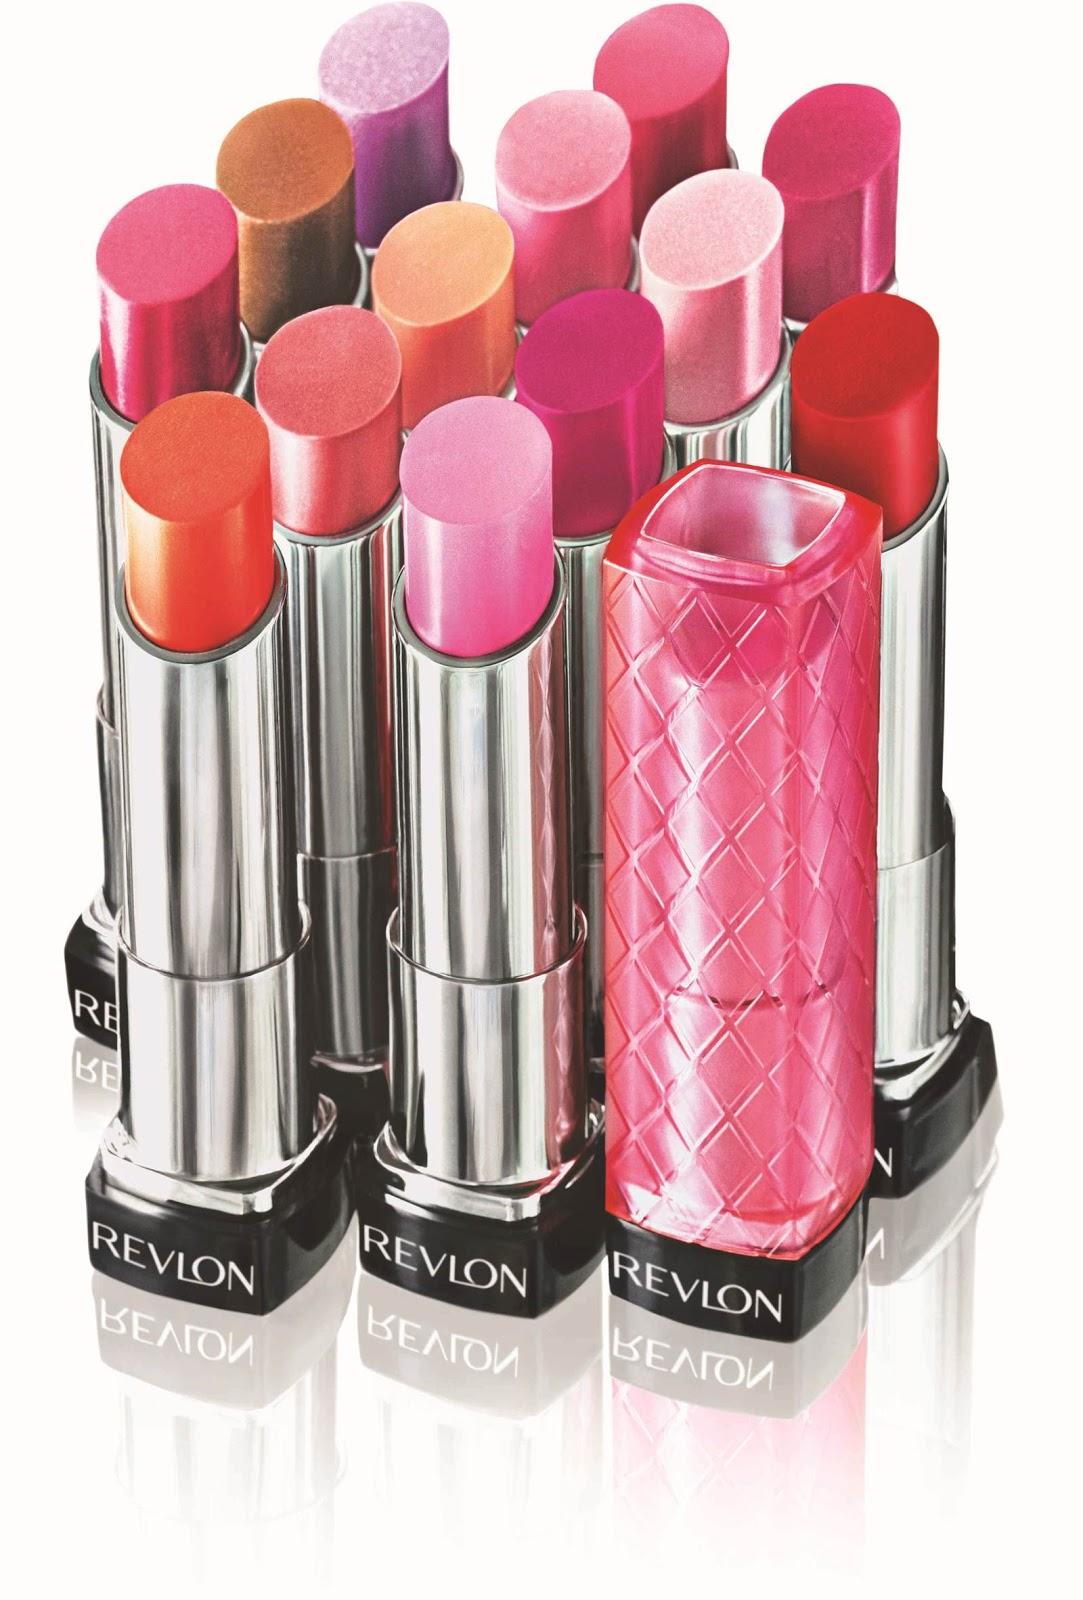 Indian Vanity Case: Revlon Colorburst Lip Butter Now In India!